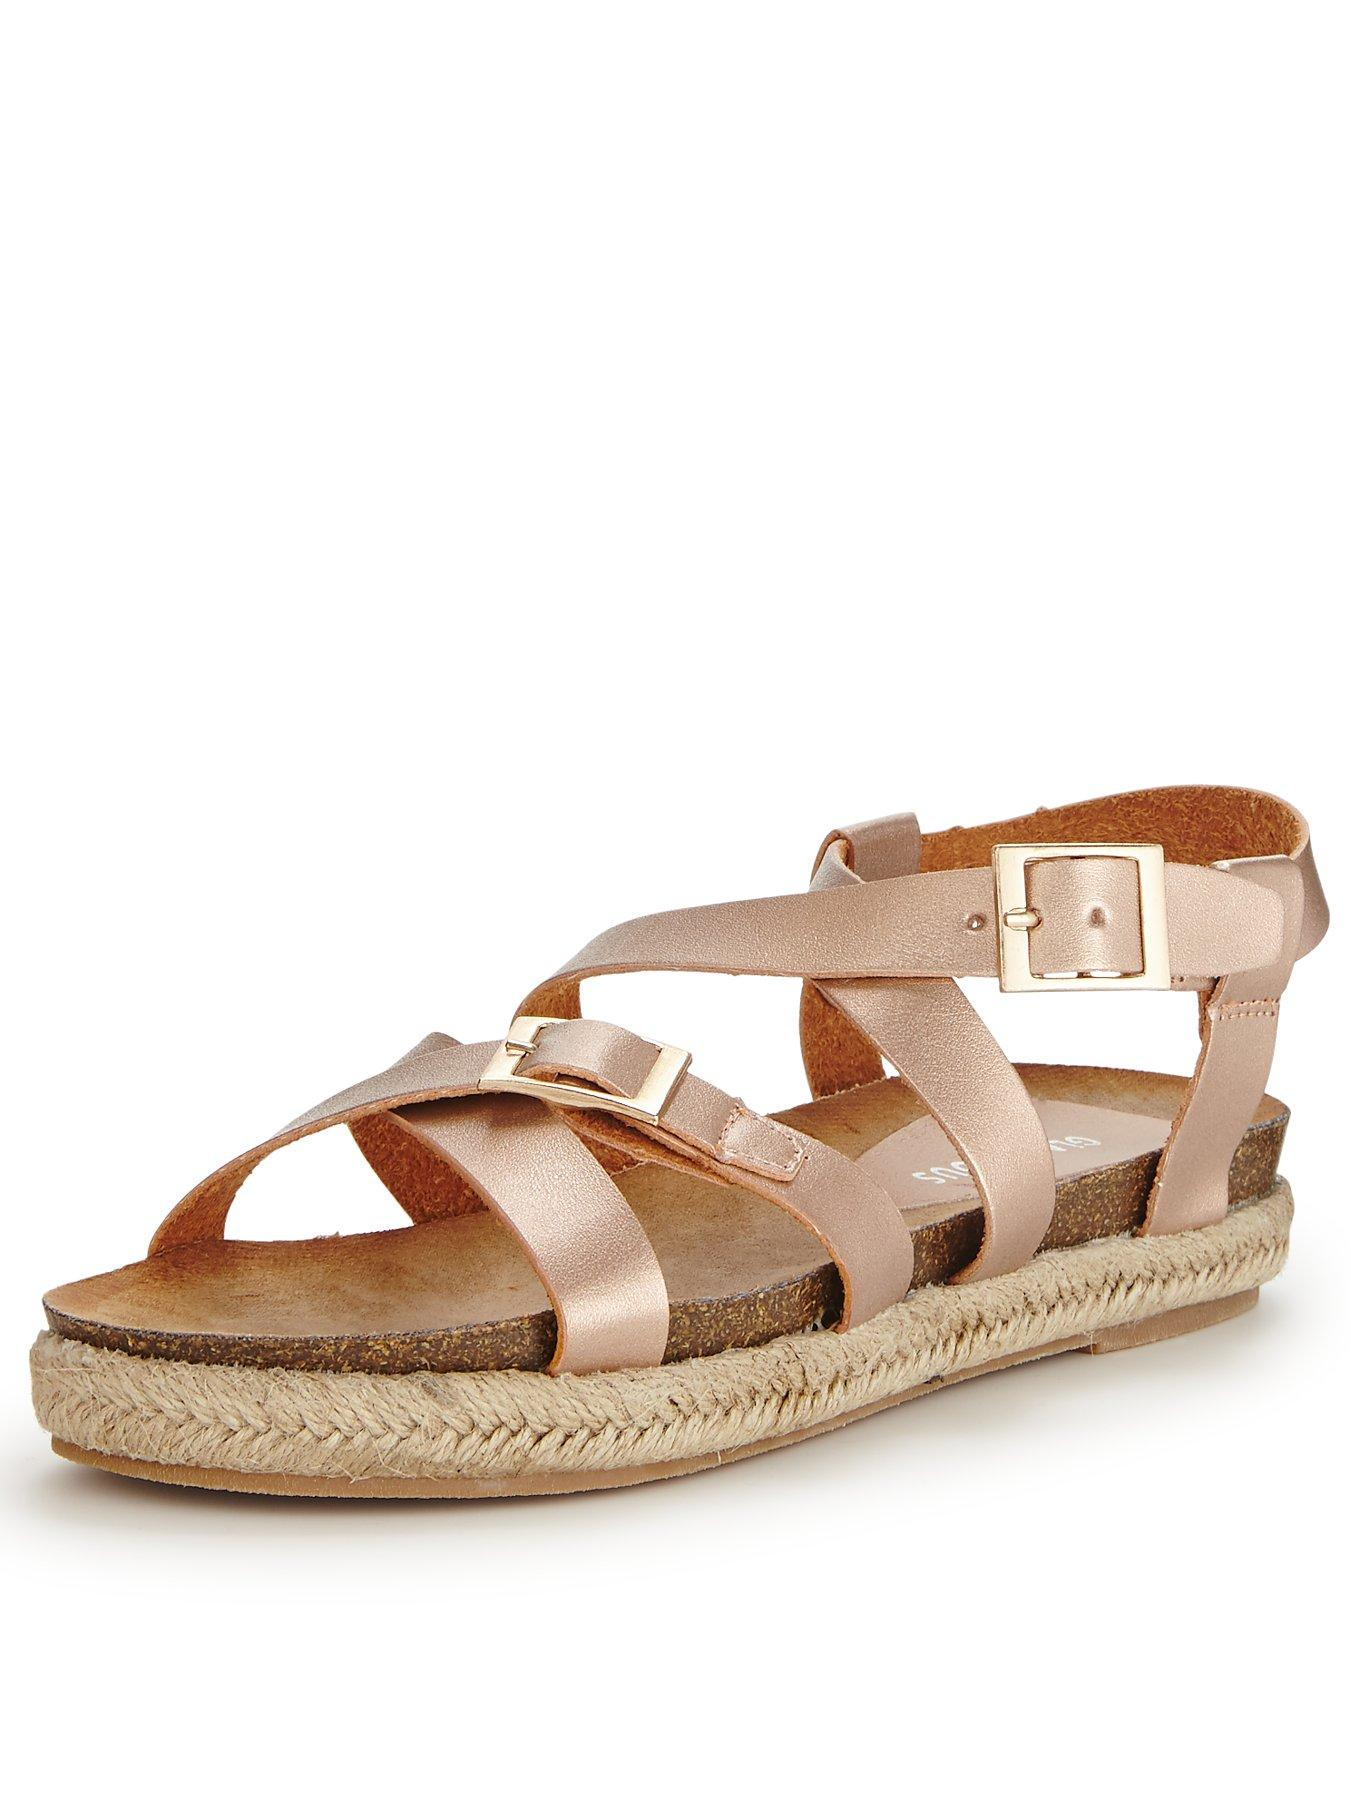 Glamorous Buckle Gladiator Sandals